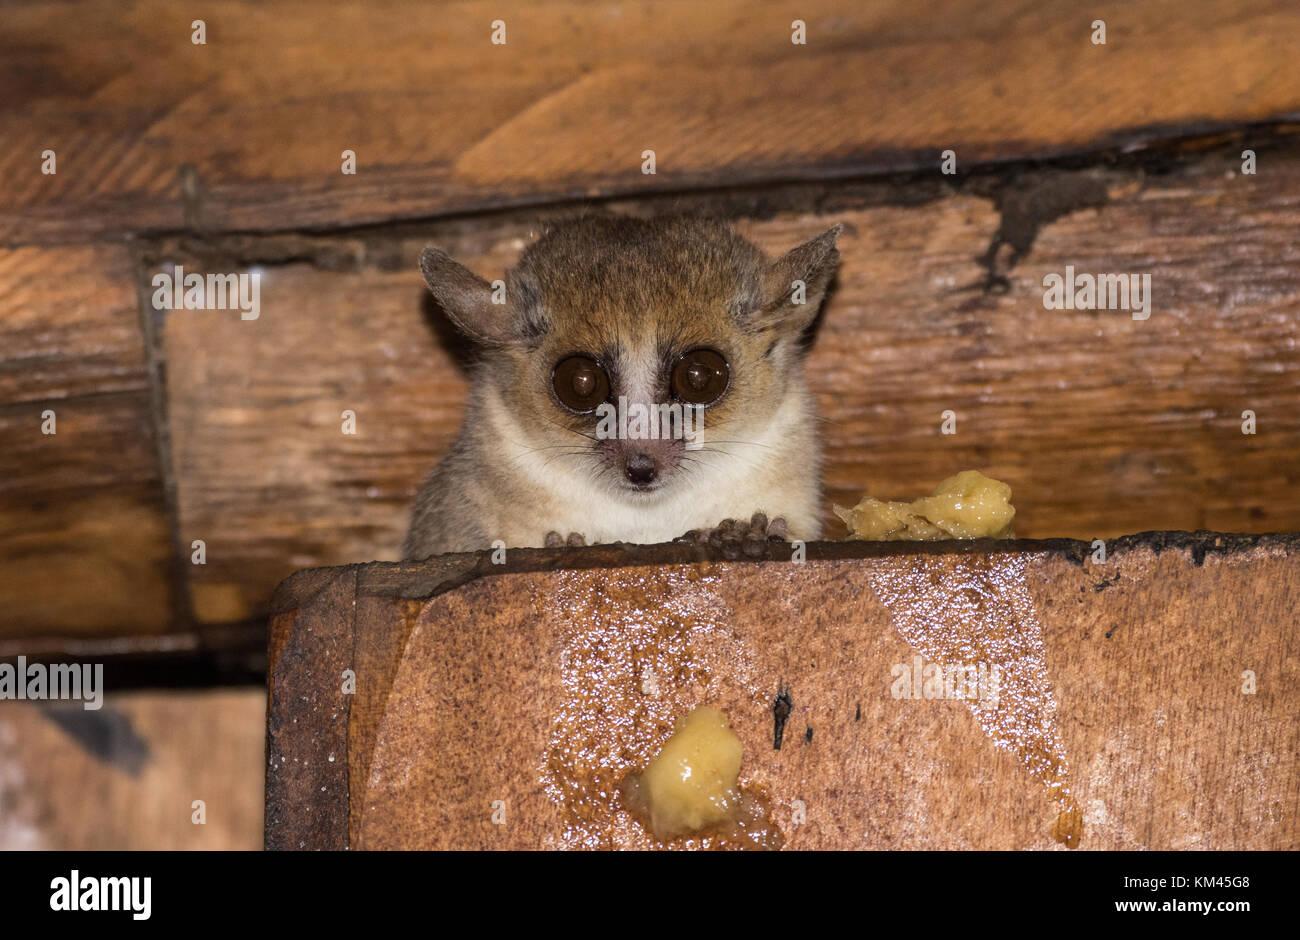 Baby Gray Mouse Lemur